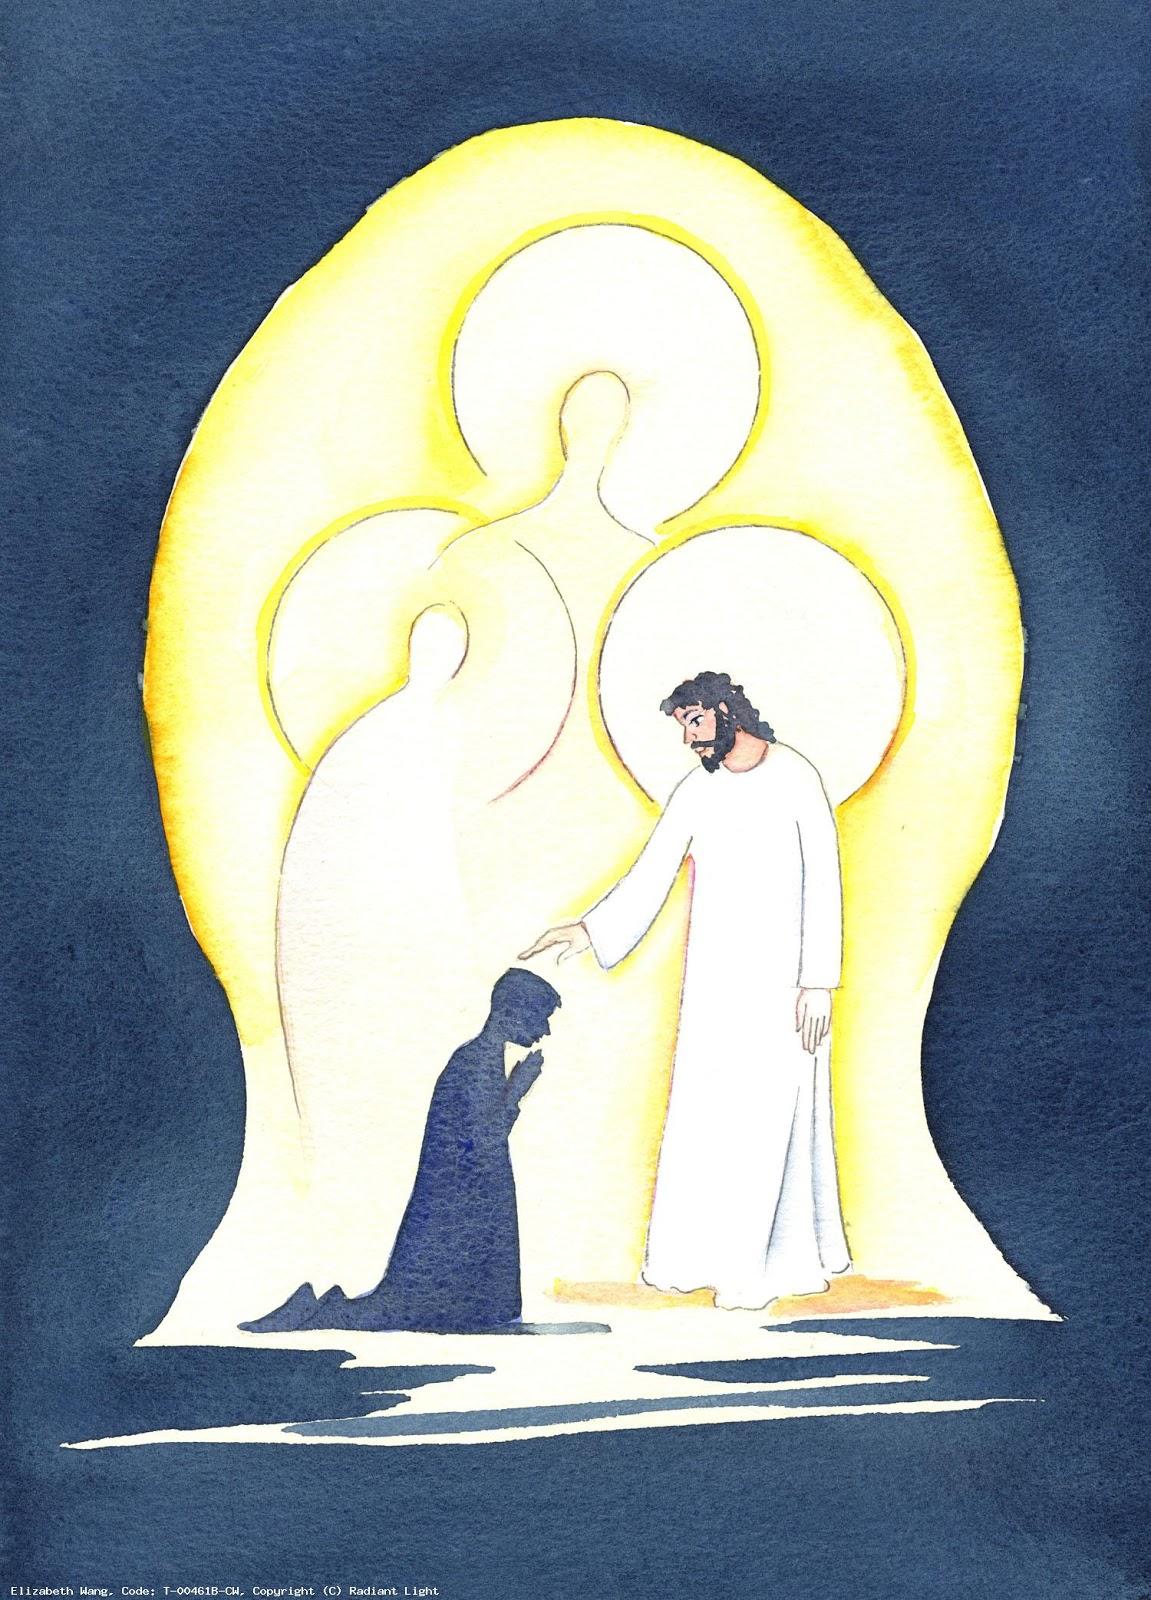 LiturgyTools net: Pictures for Trinity Sunday, Year B